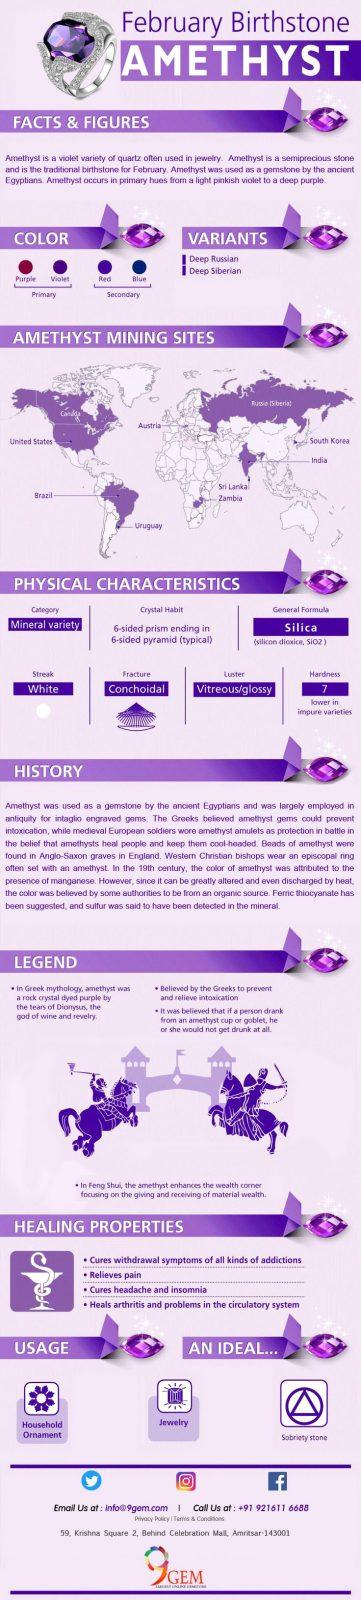 Amethyst Gemstone: Facts, Properties, Usage, Origins-9Gem